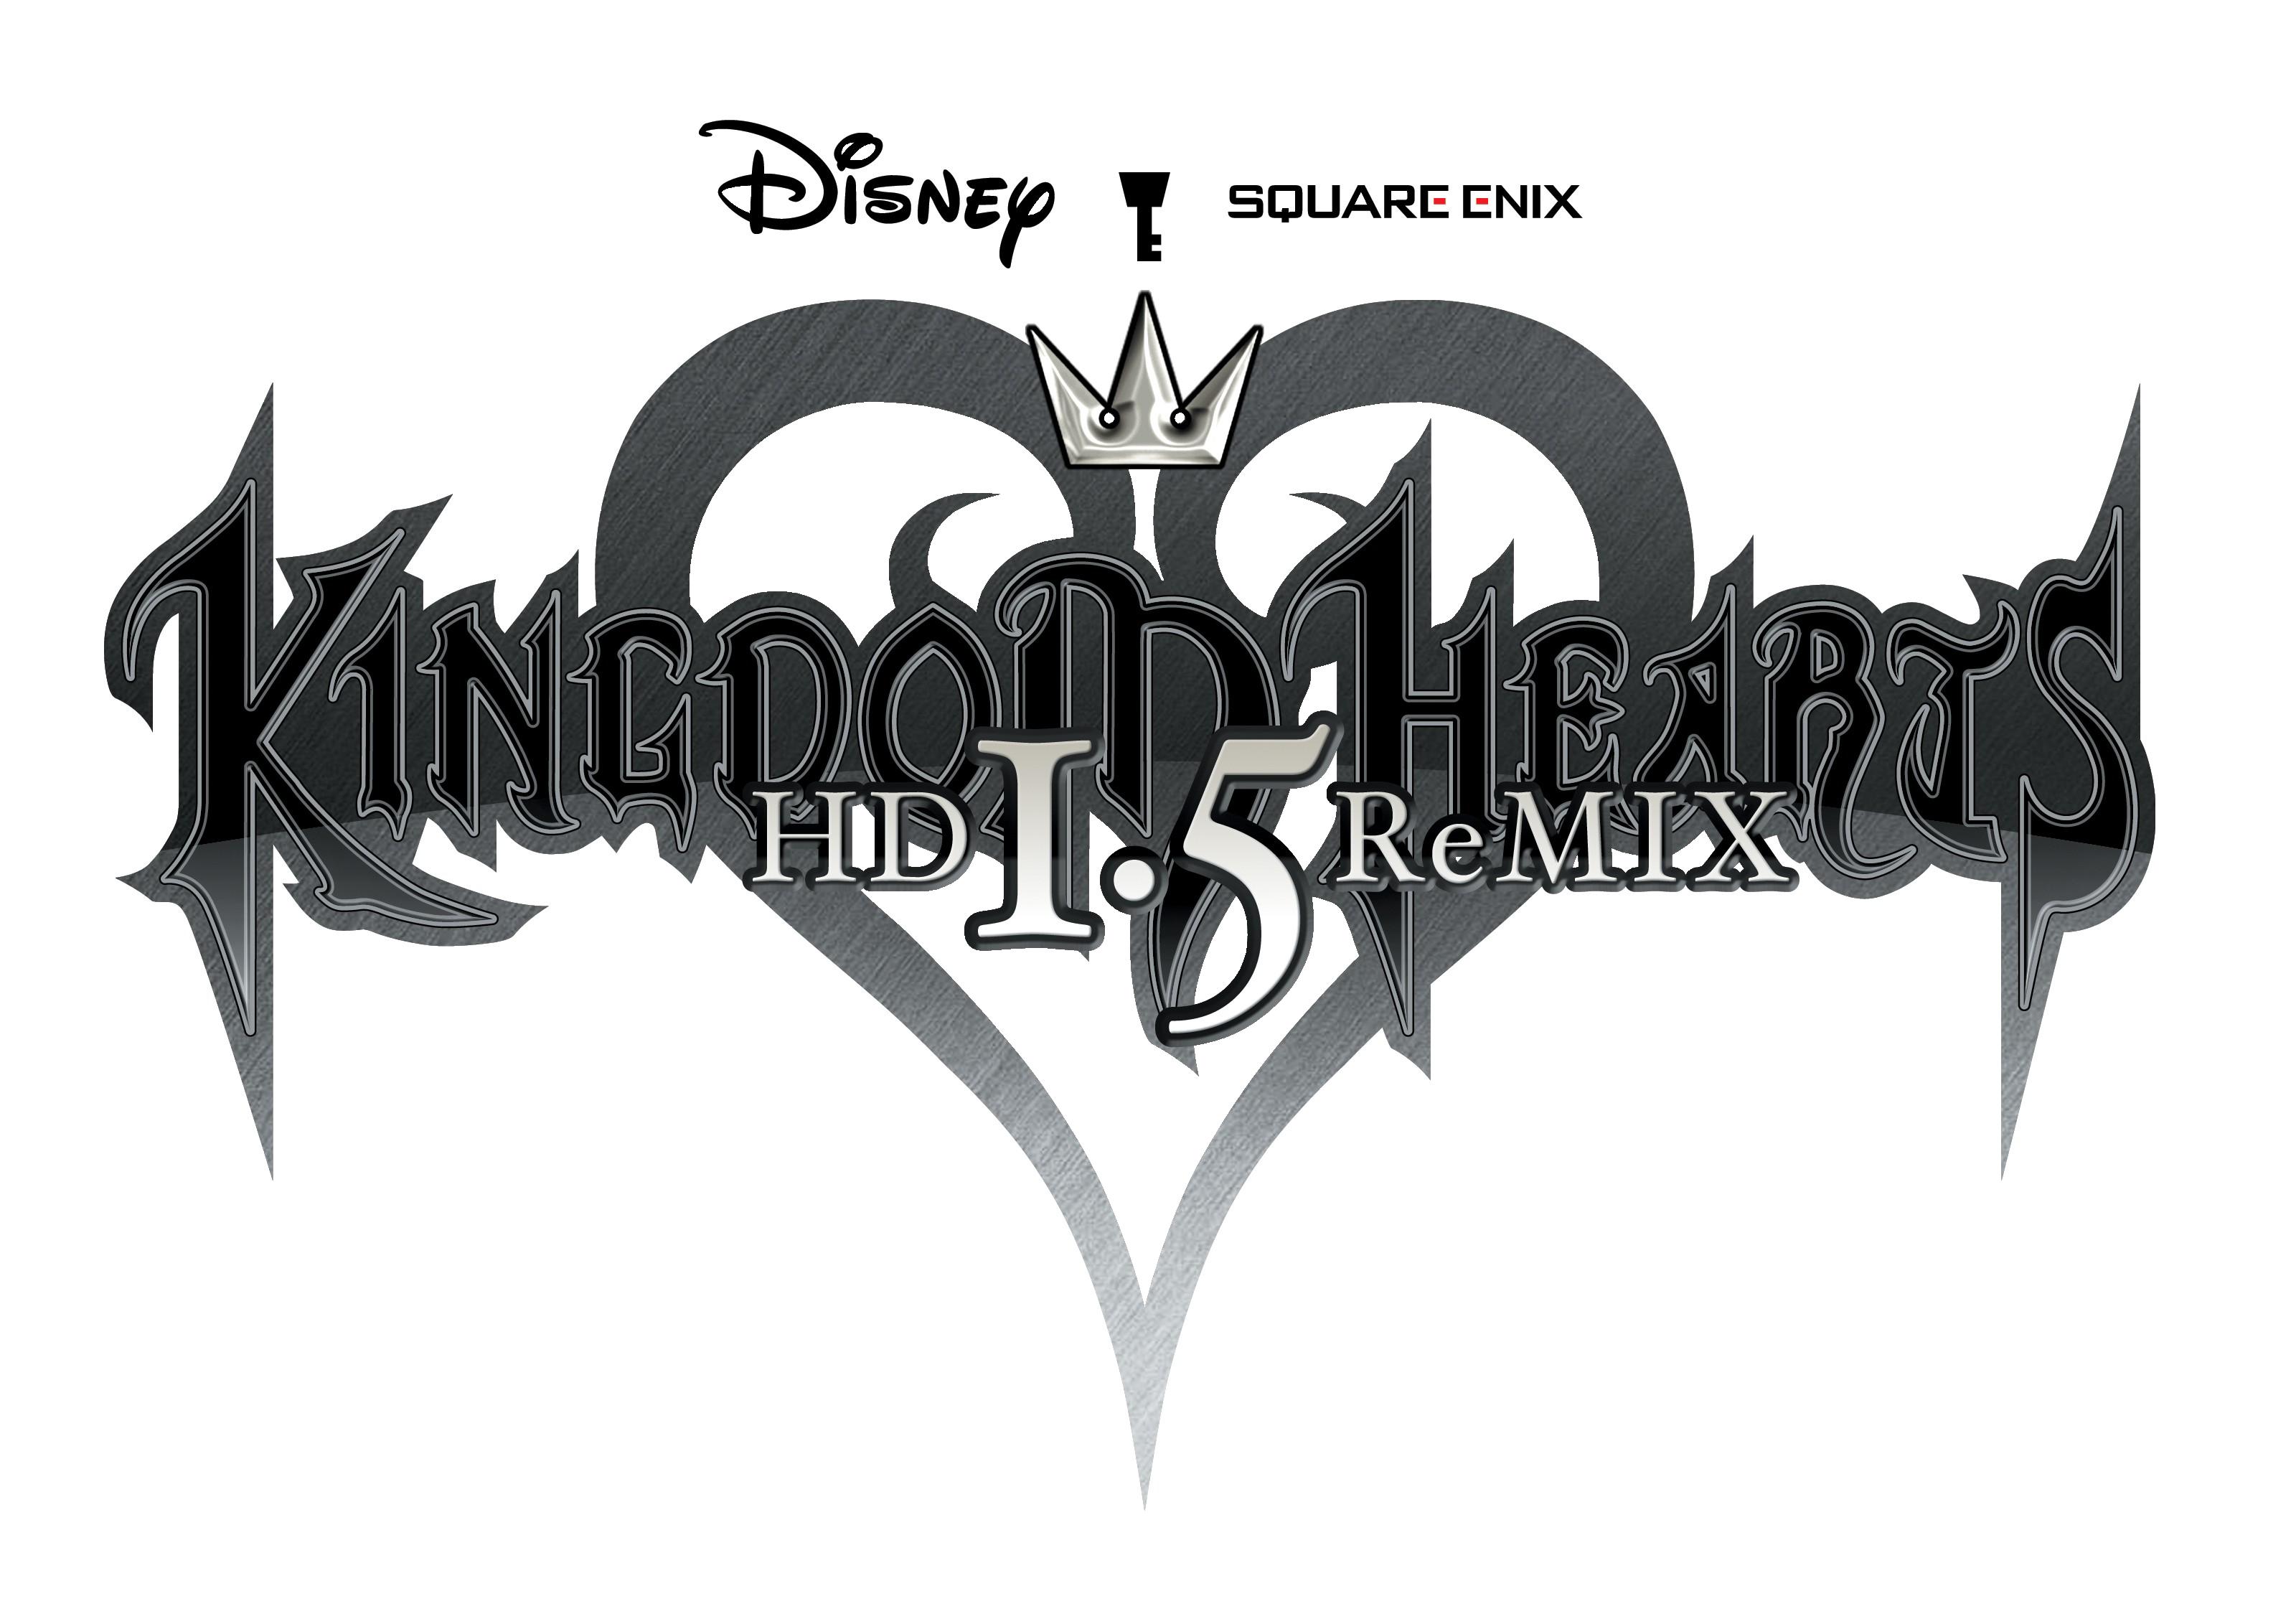 Image hd remix disney. Kingdom hearts logo png